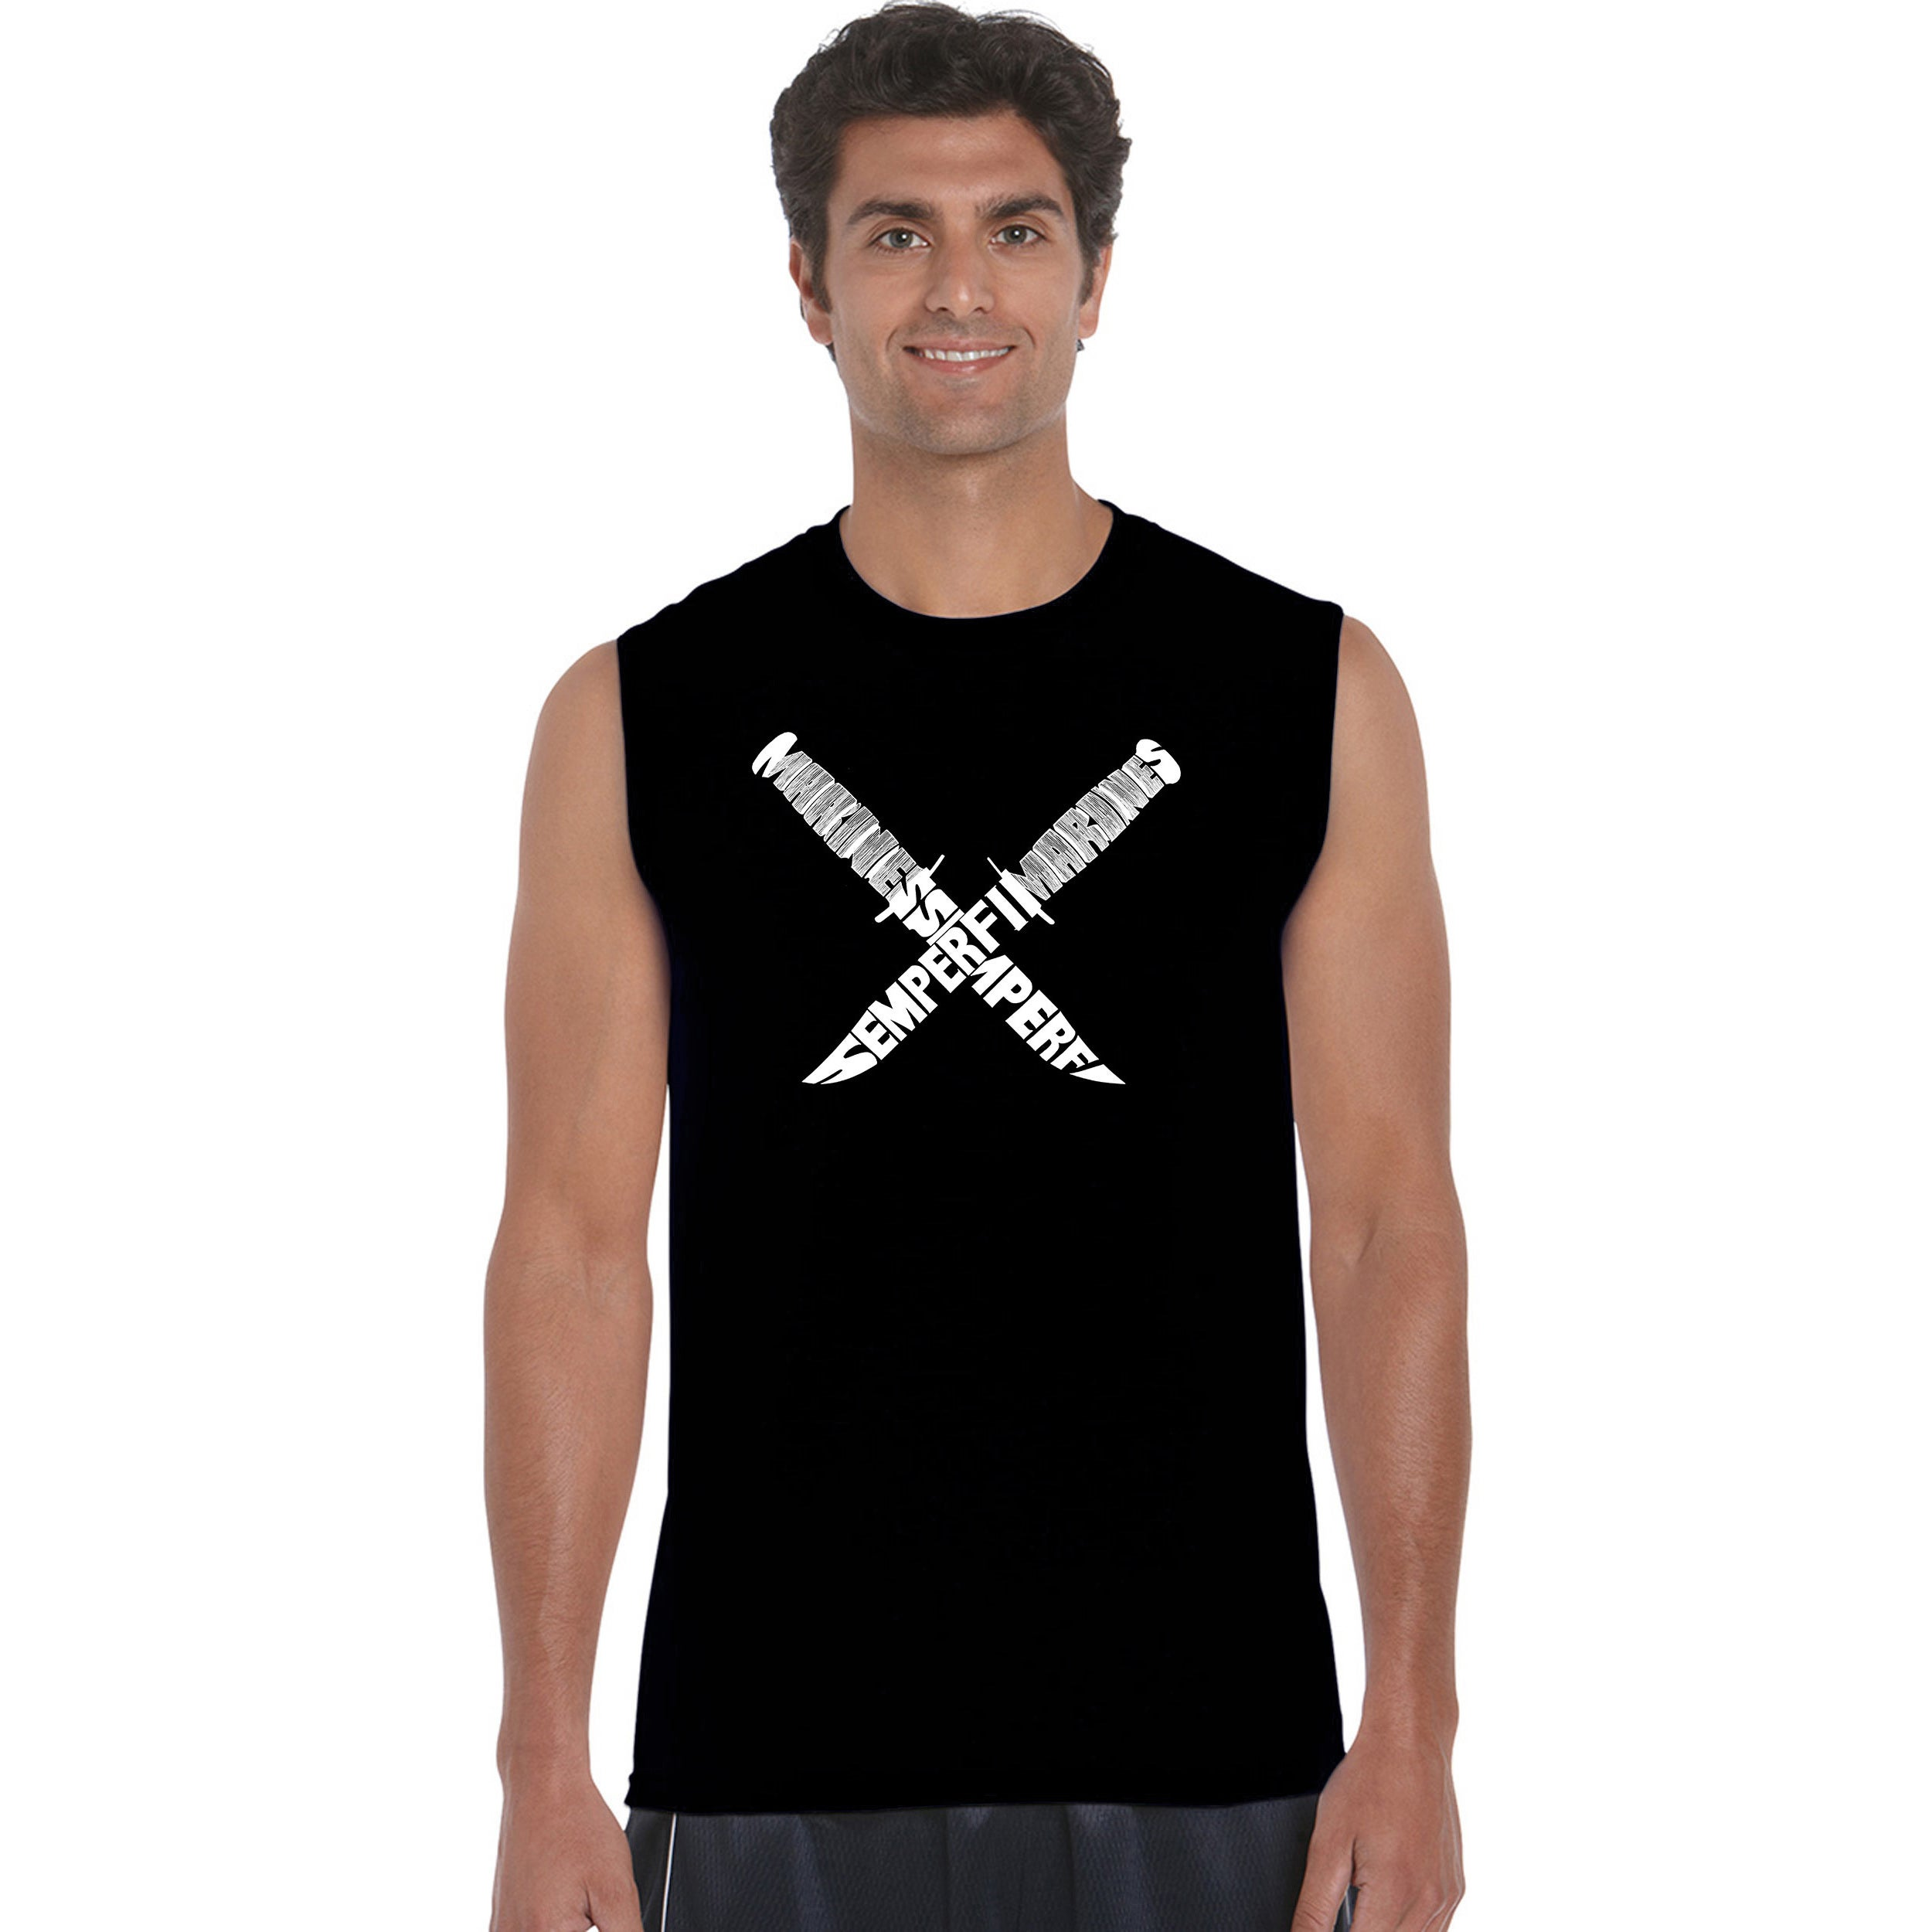 Los Angeles Pop Art Men's Sleeveless T-shirt - Semper Fi ...